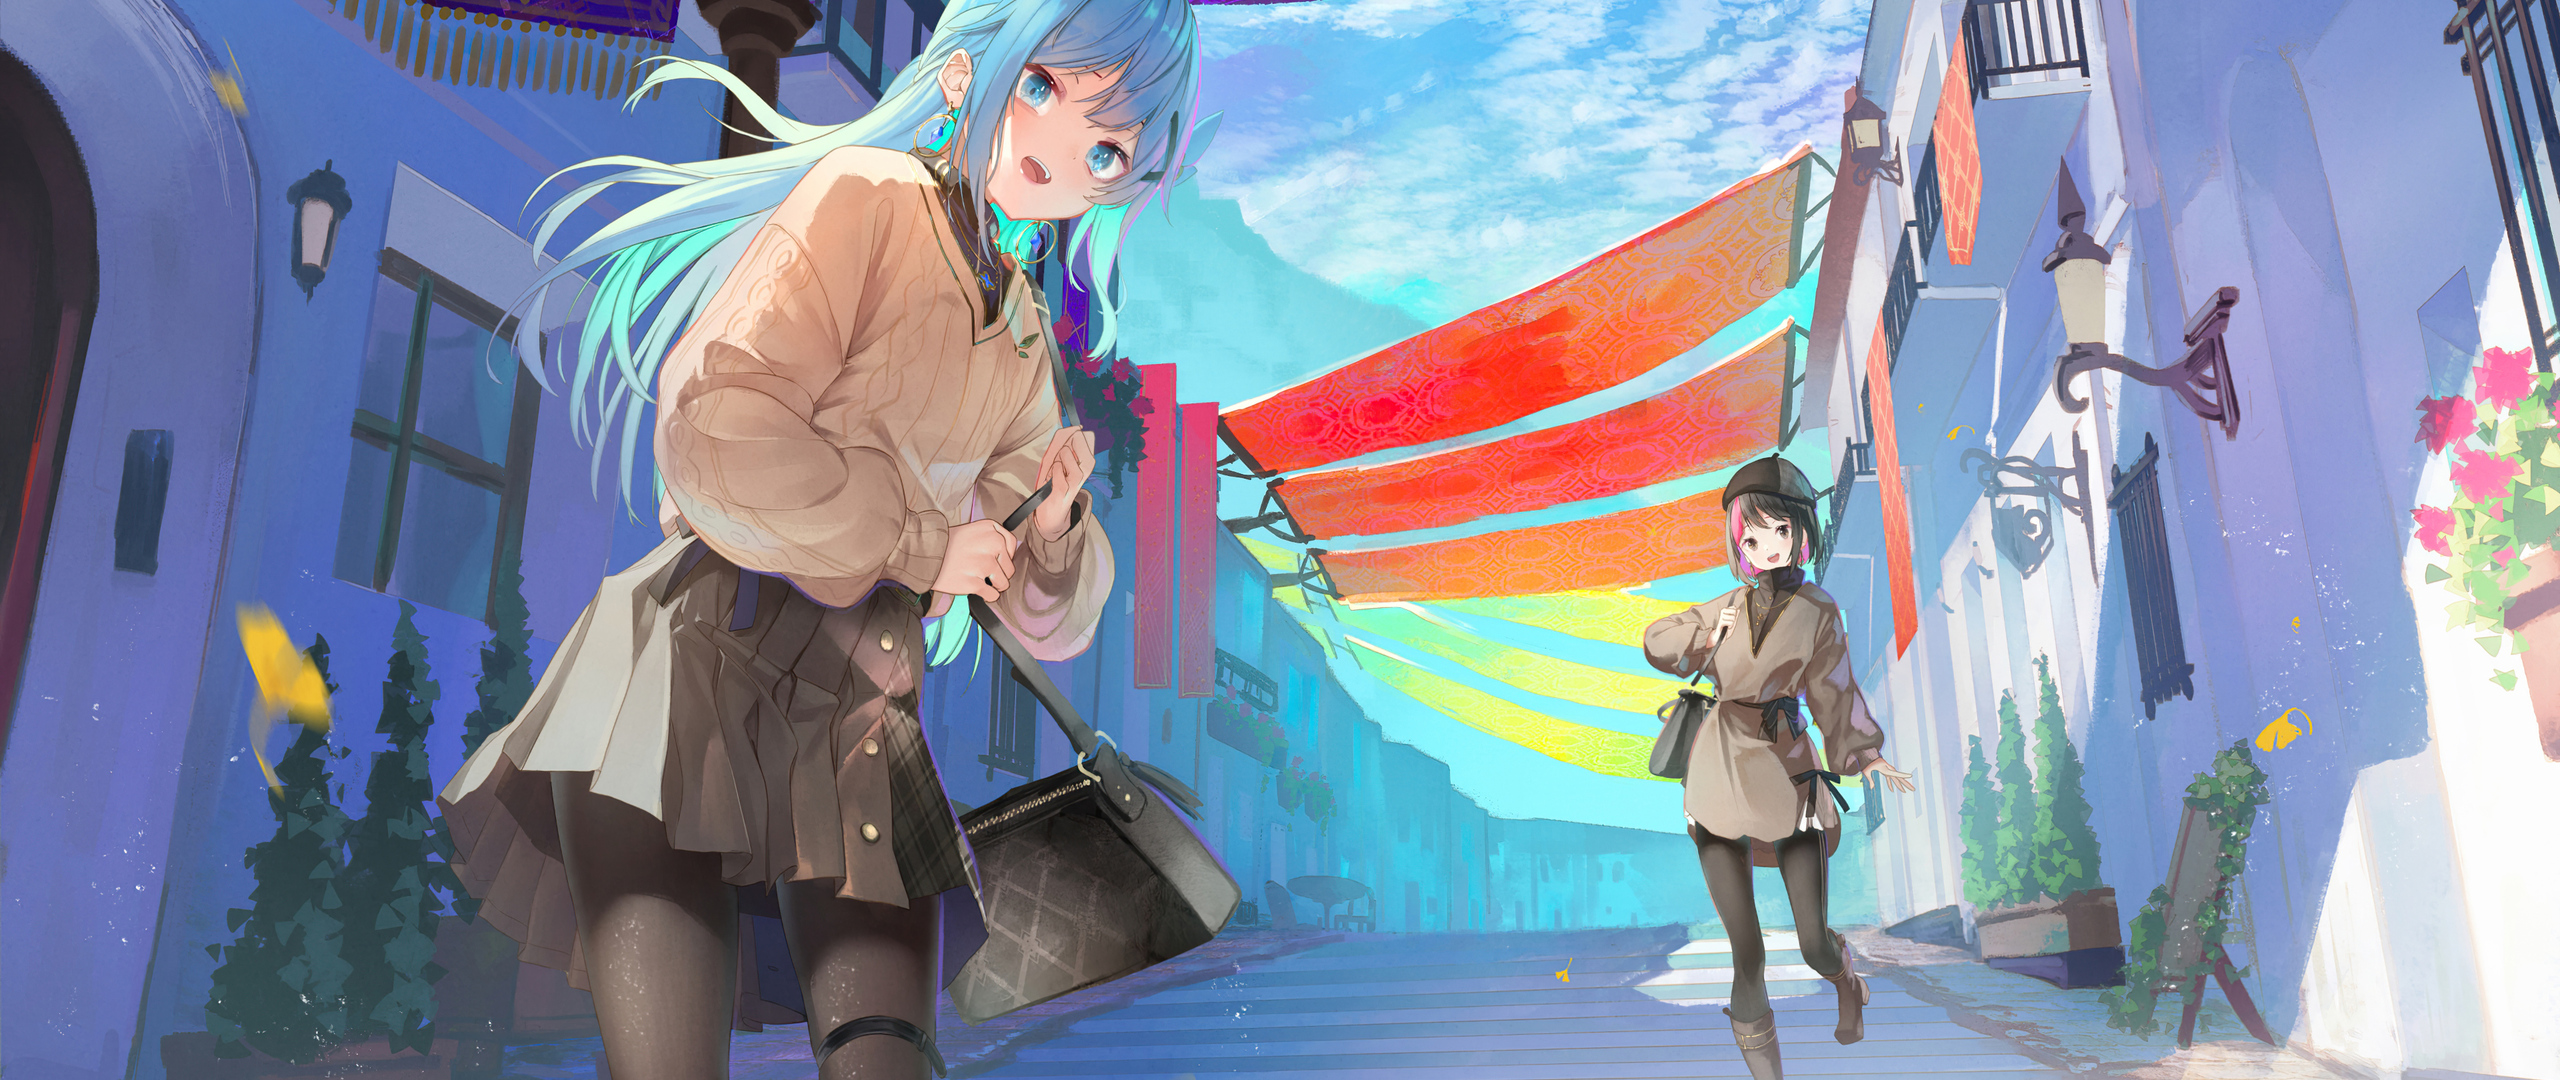 anime-girl-after-school-4k-h2.jpg